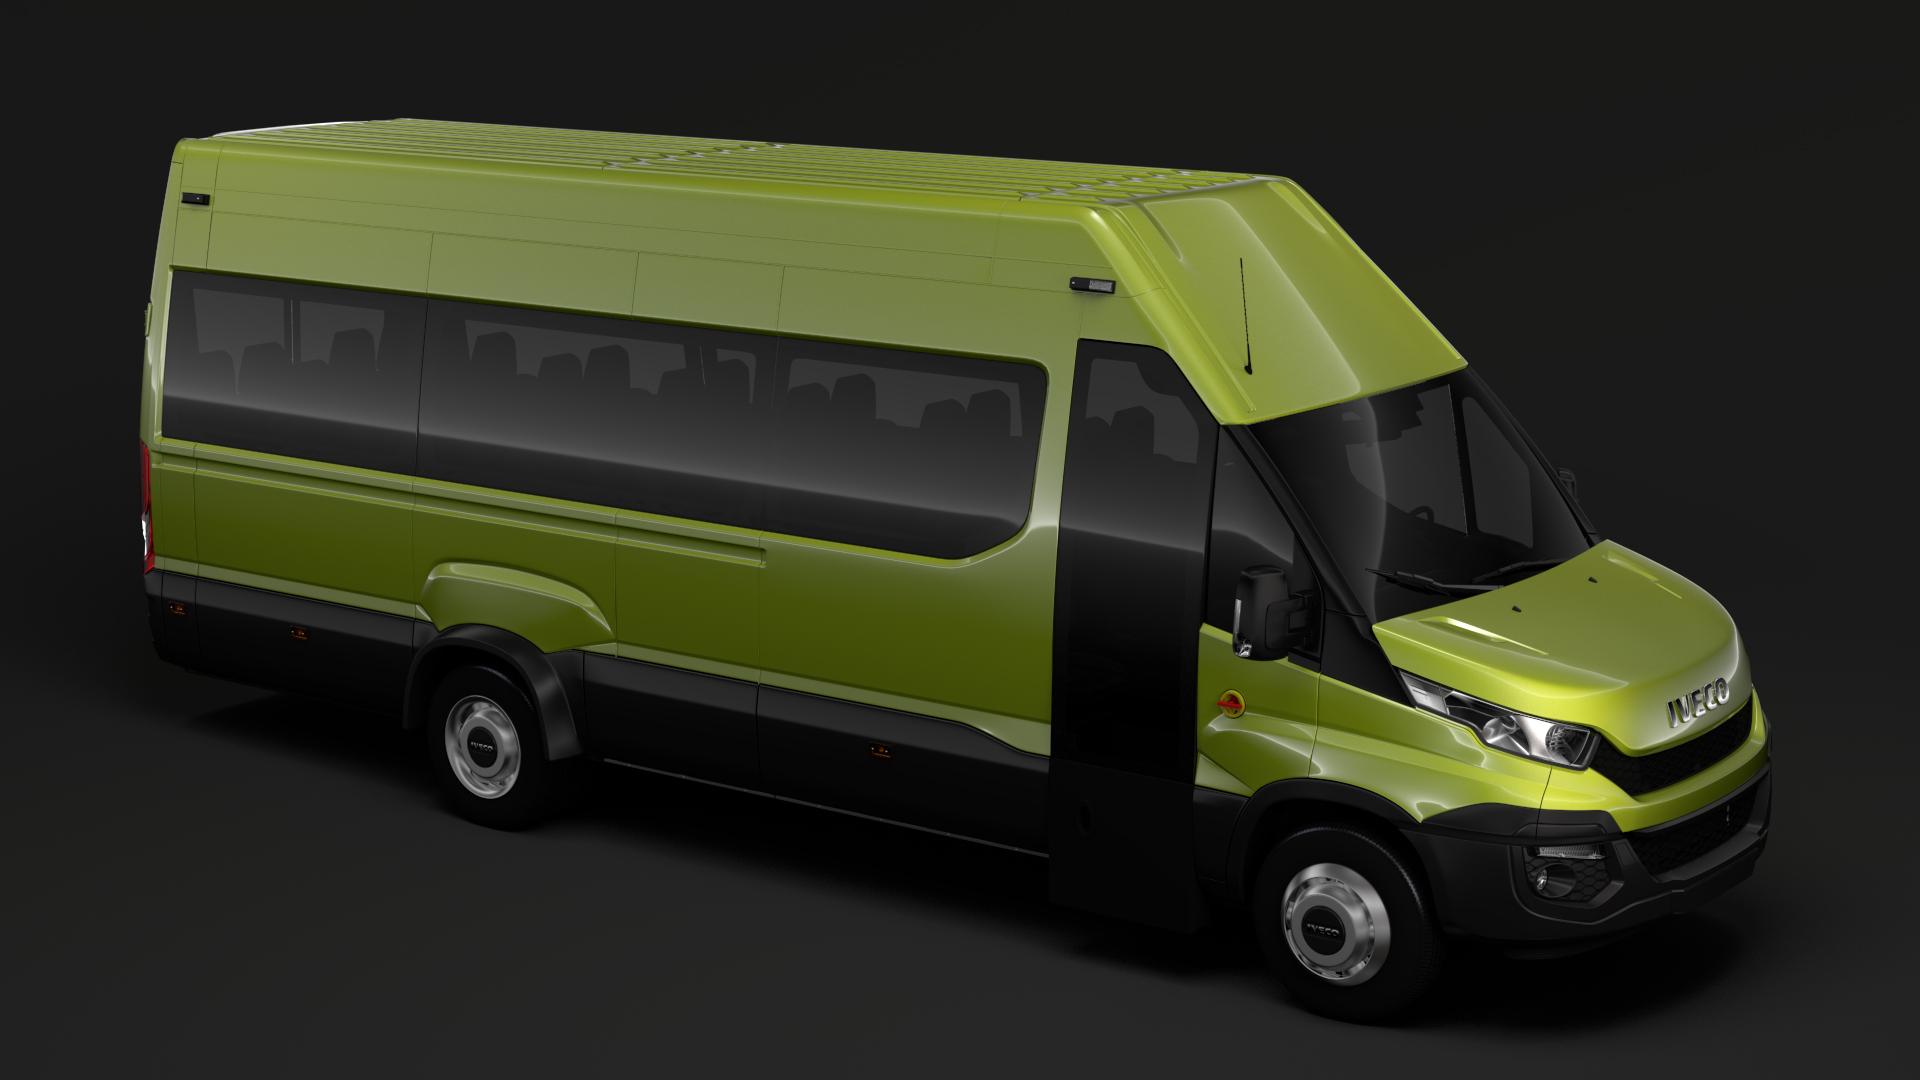 iveco daily tourus l5h3 20014-2016 3d model max fbx c4d lwo ma mb hrc xsi obj 275711